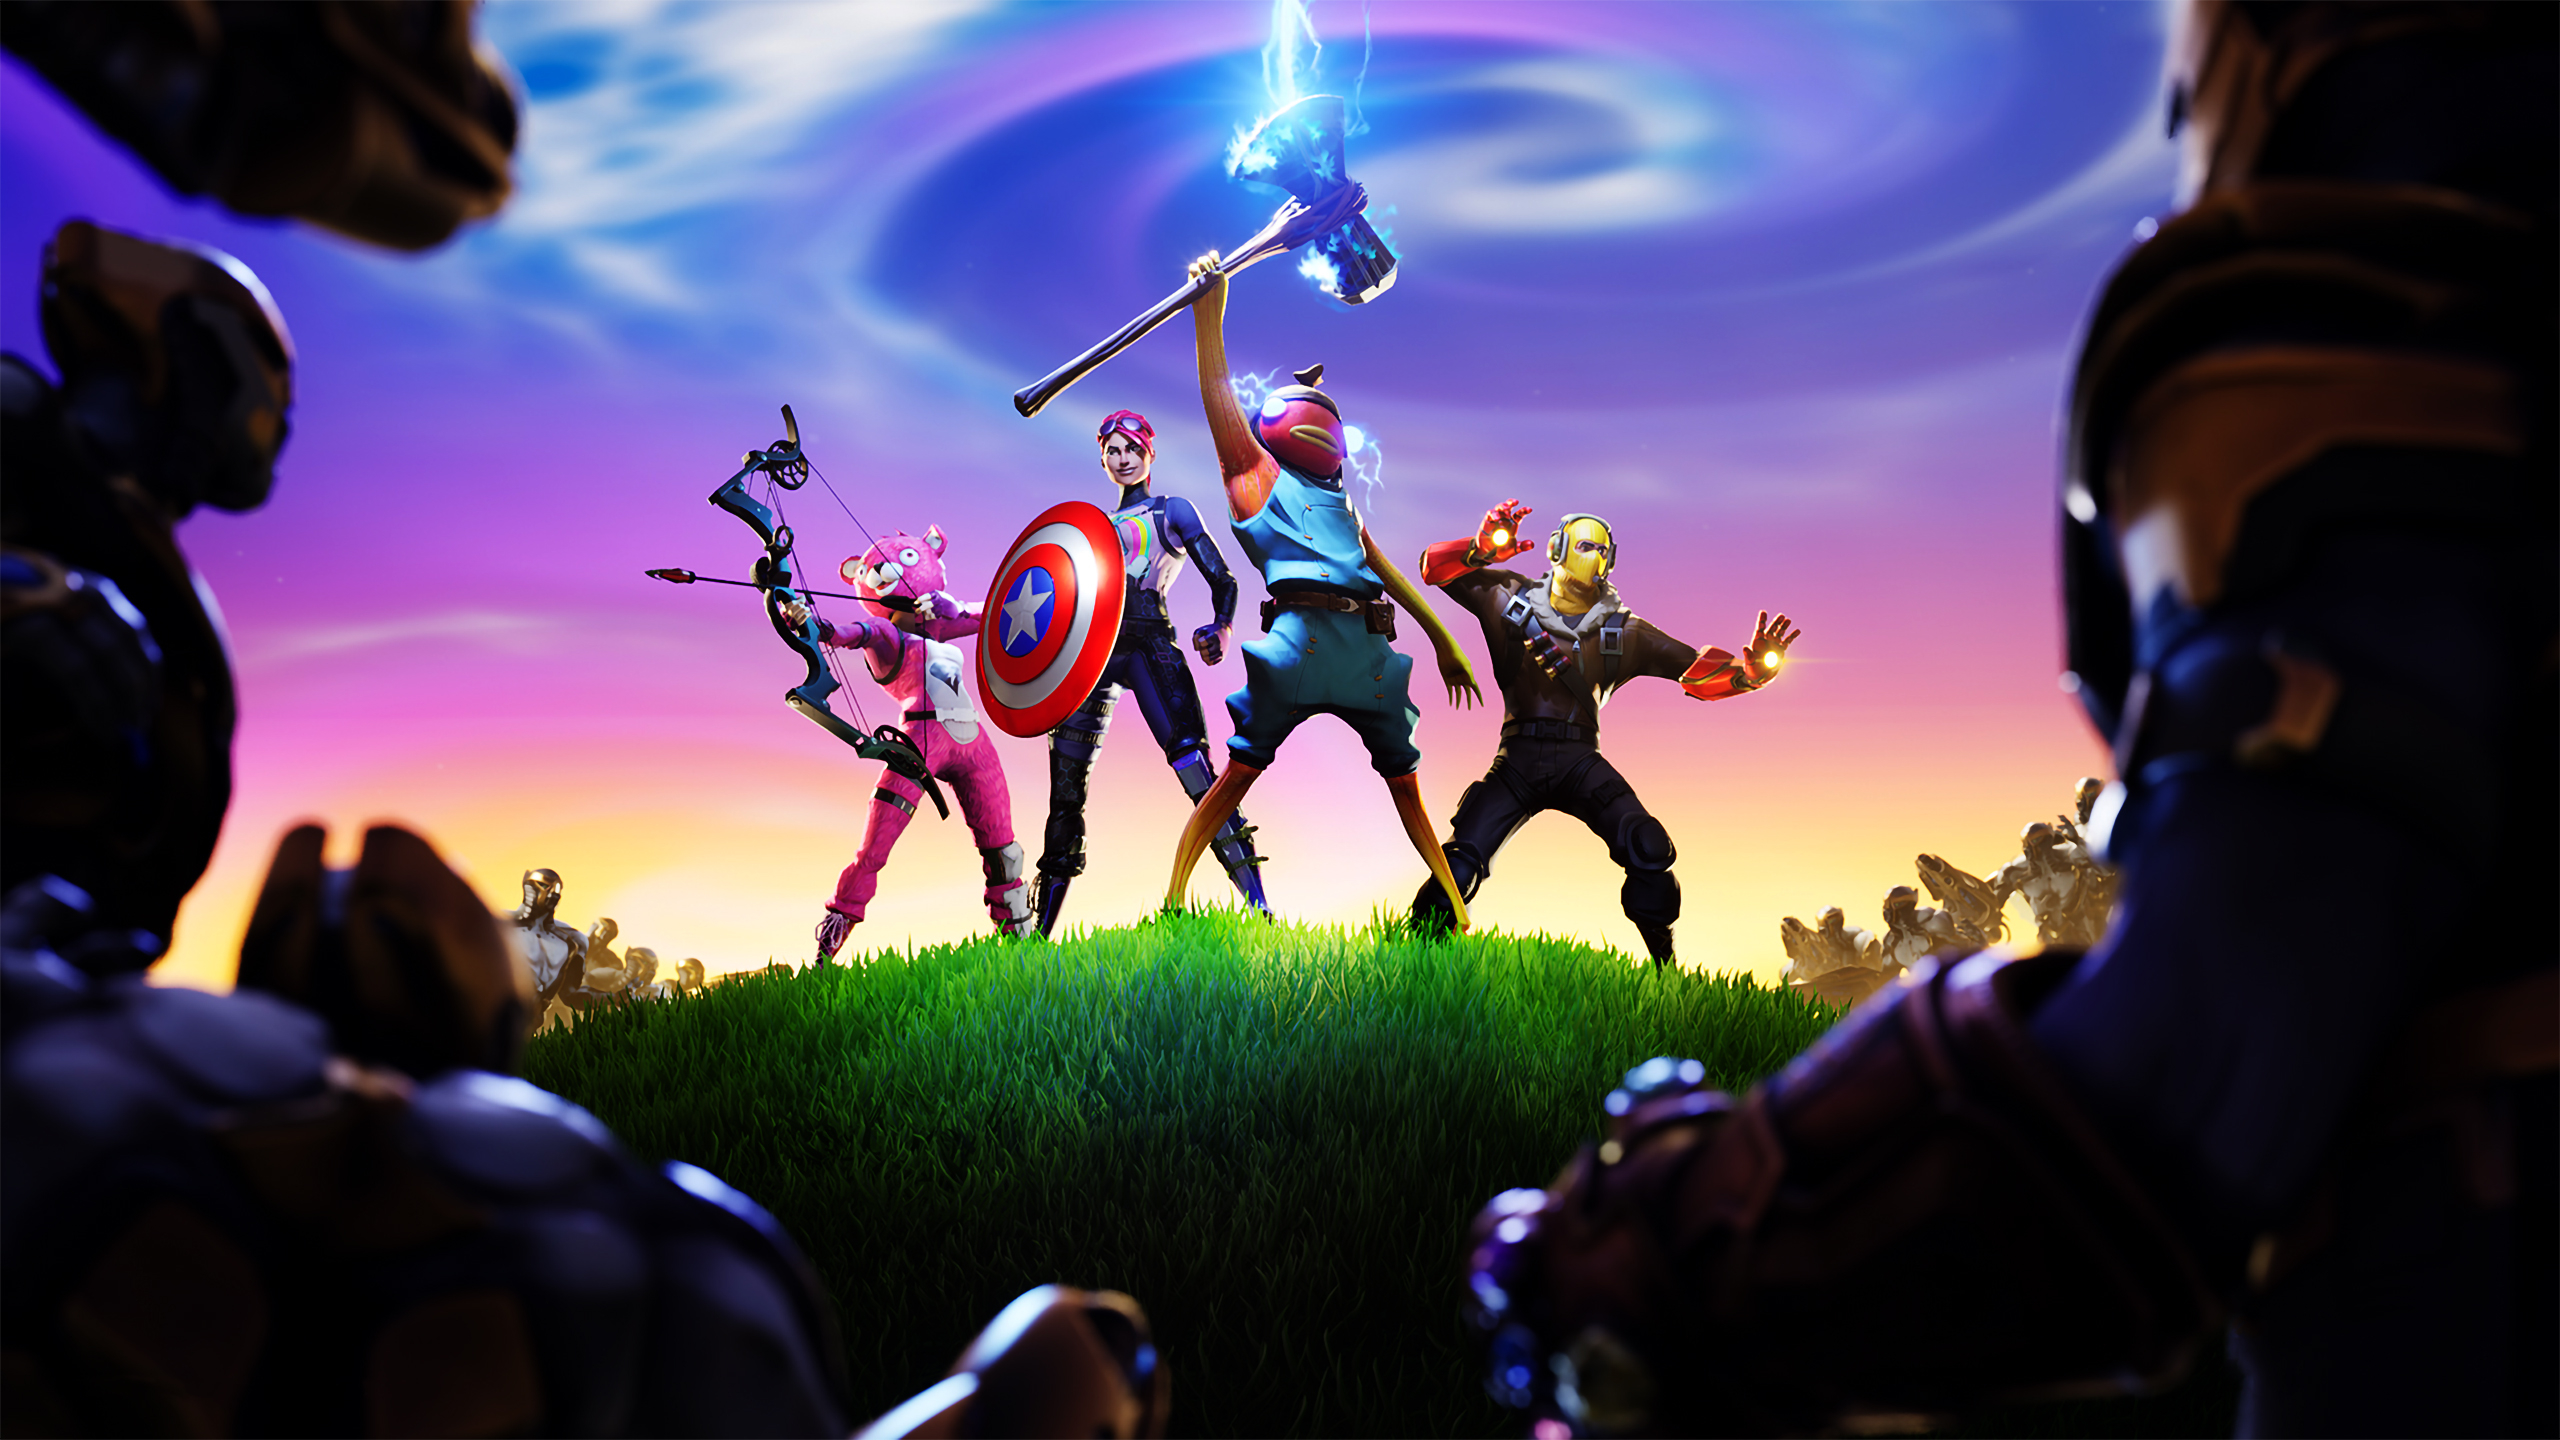 Fortnite X Avengers Wallpaper Hd Games 4k Wallpapers